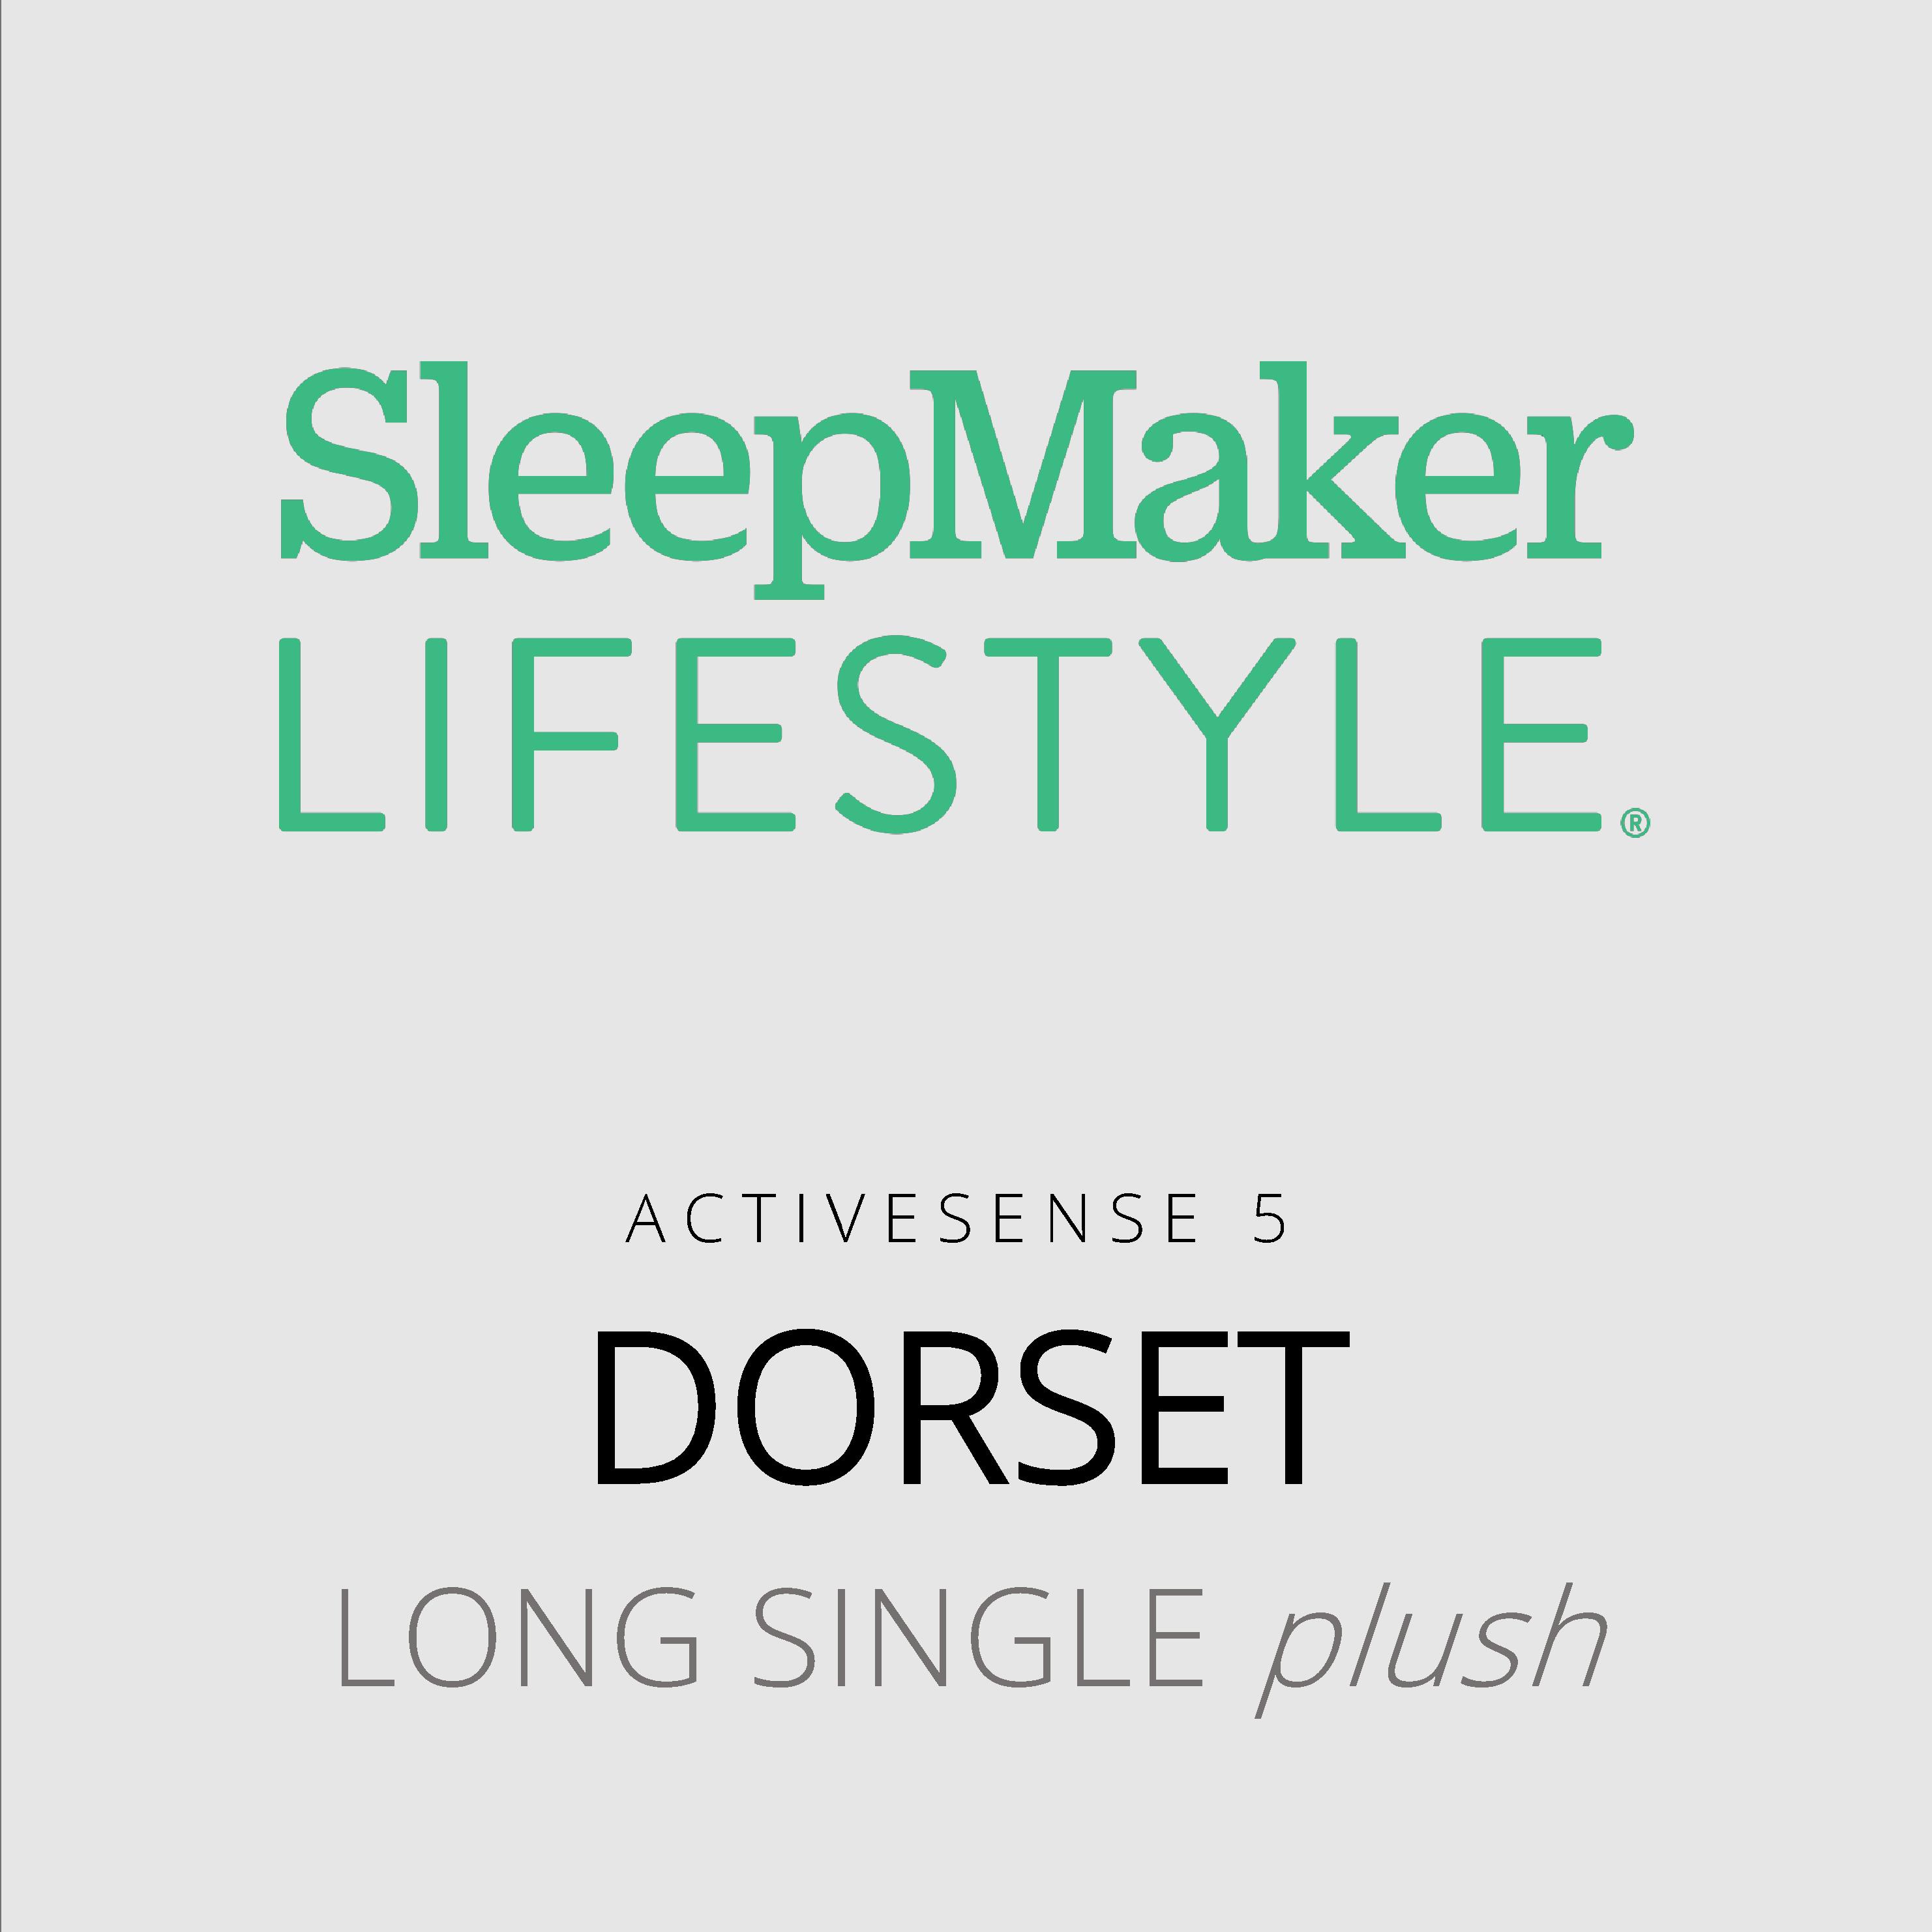 SleepMaker Lifestyle – Dorset – ActiveSense 5 – Long Single Plush Mattress